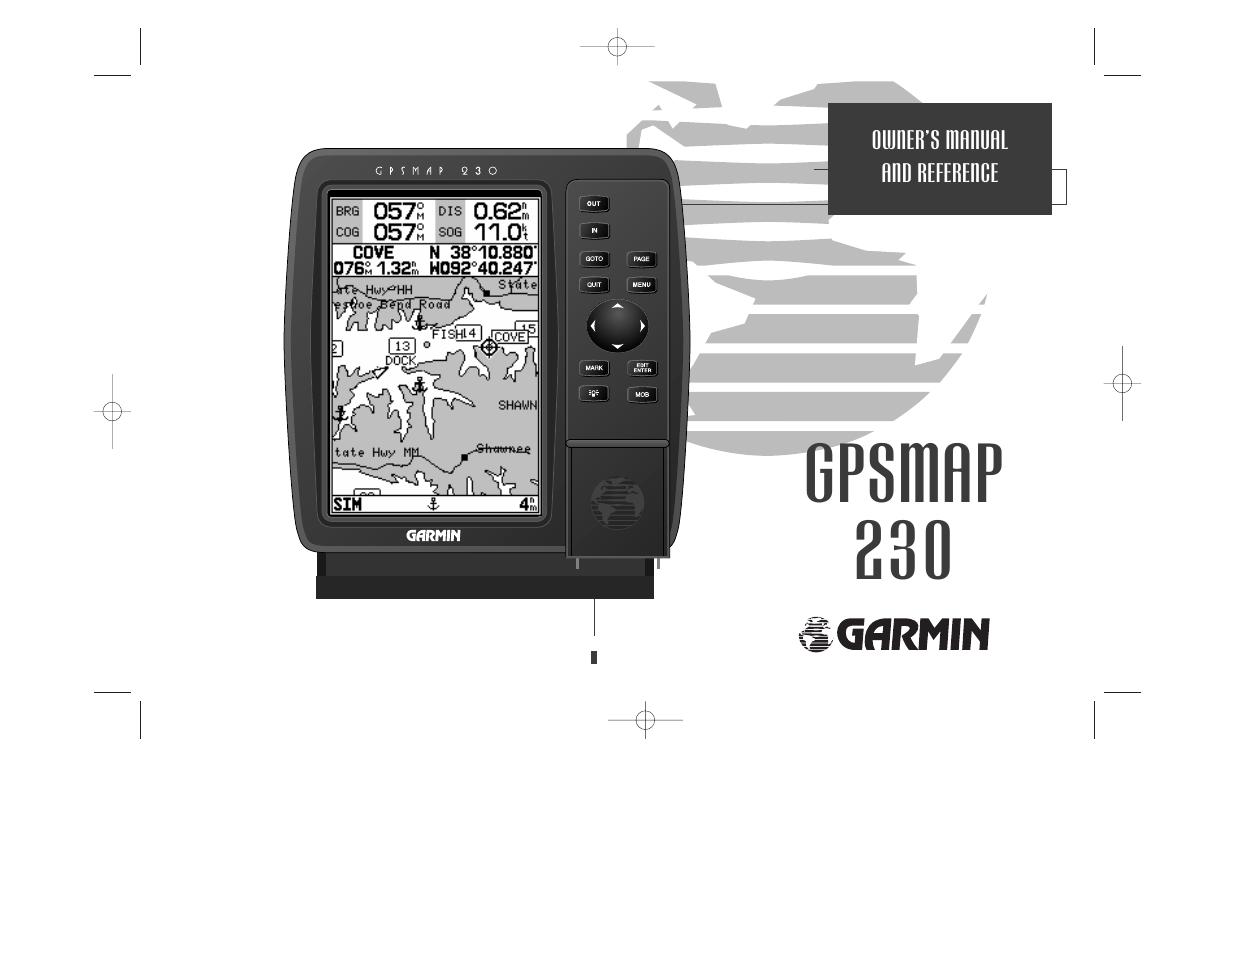 garmin gpsmap 230 user manual 96 pages rh manualsdir com garmin nuvi 880 manual garmin 800 manual